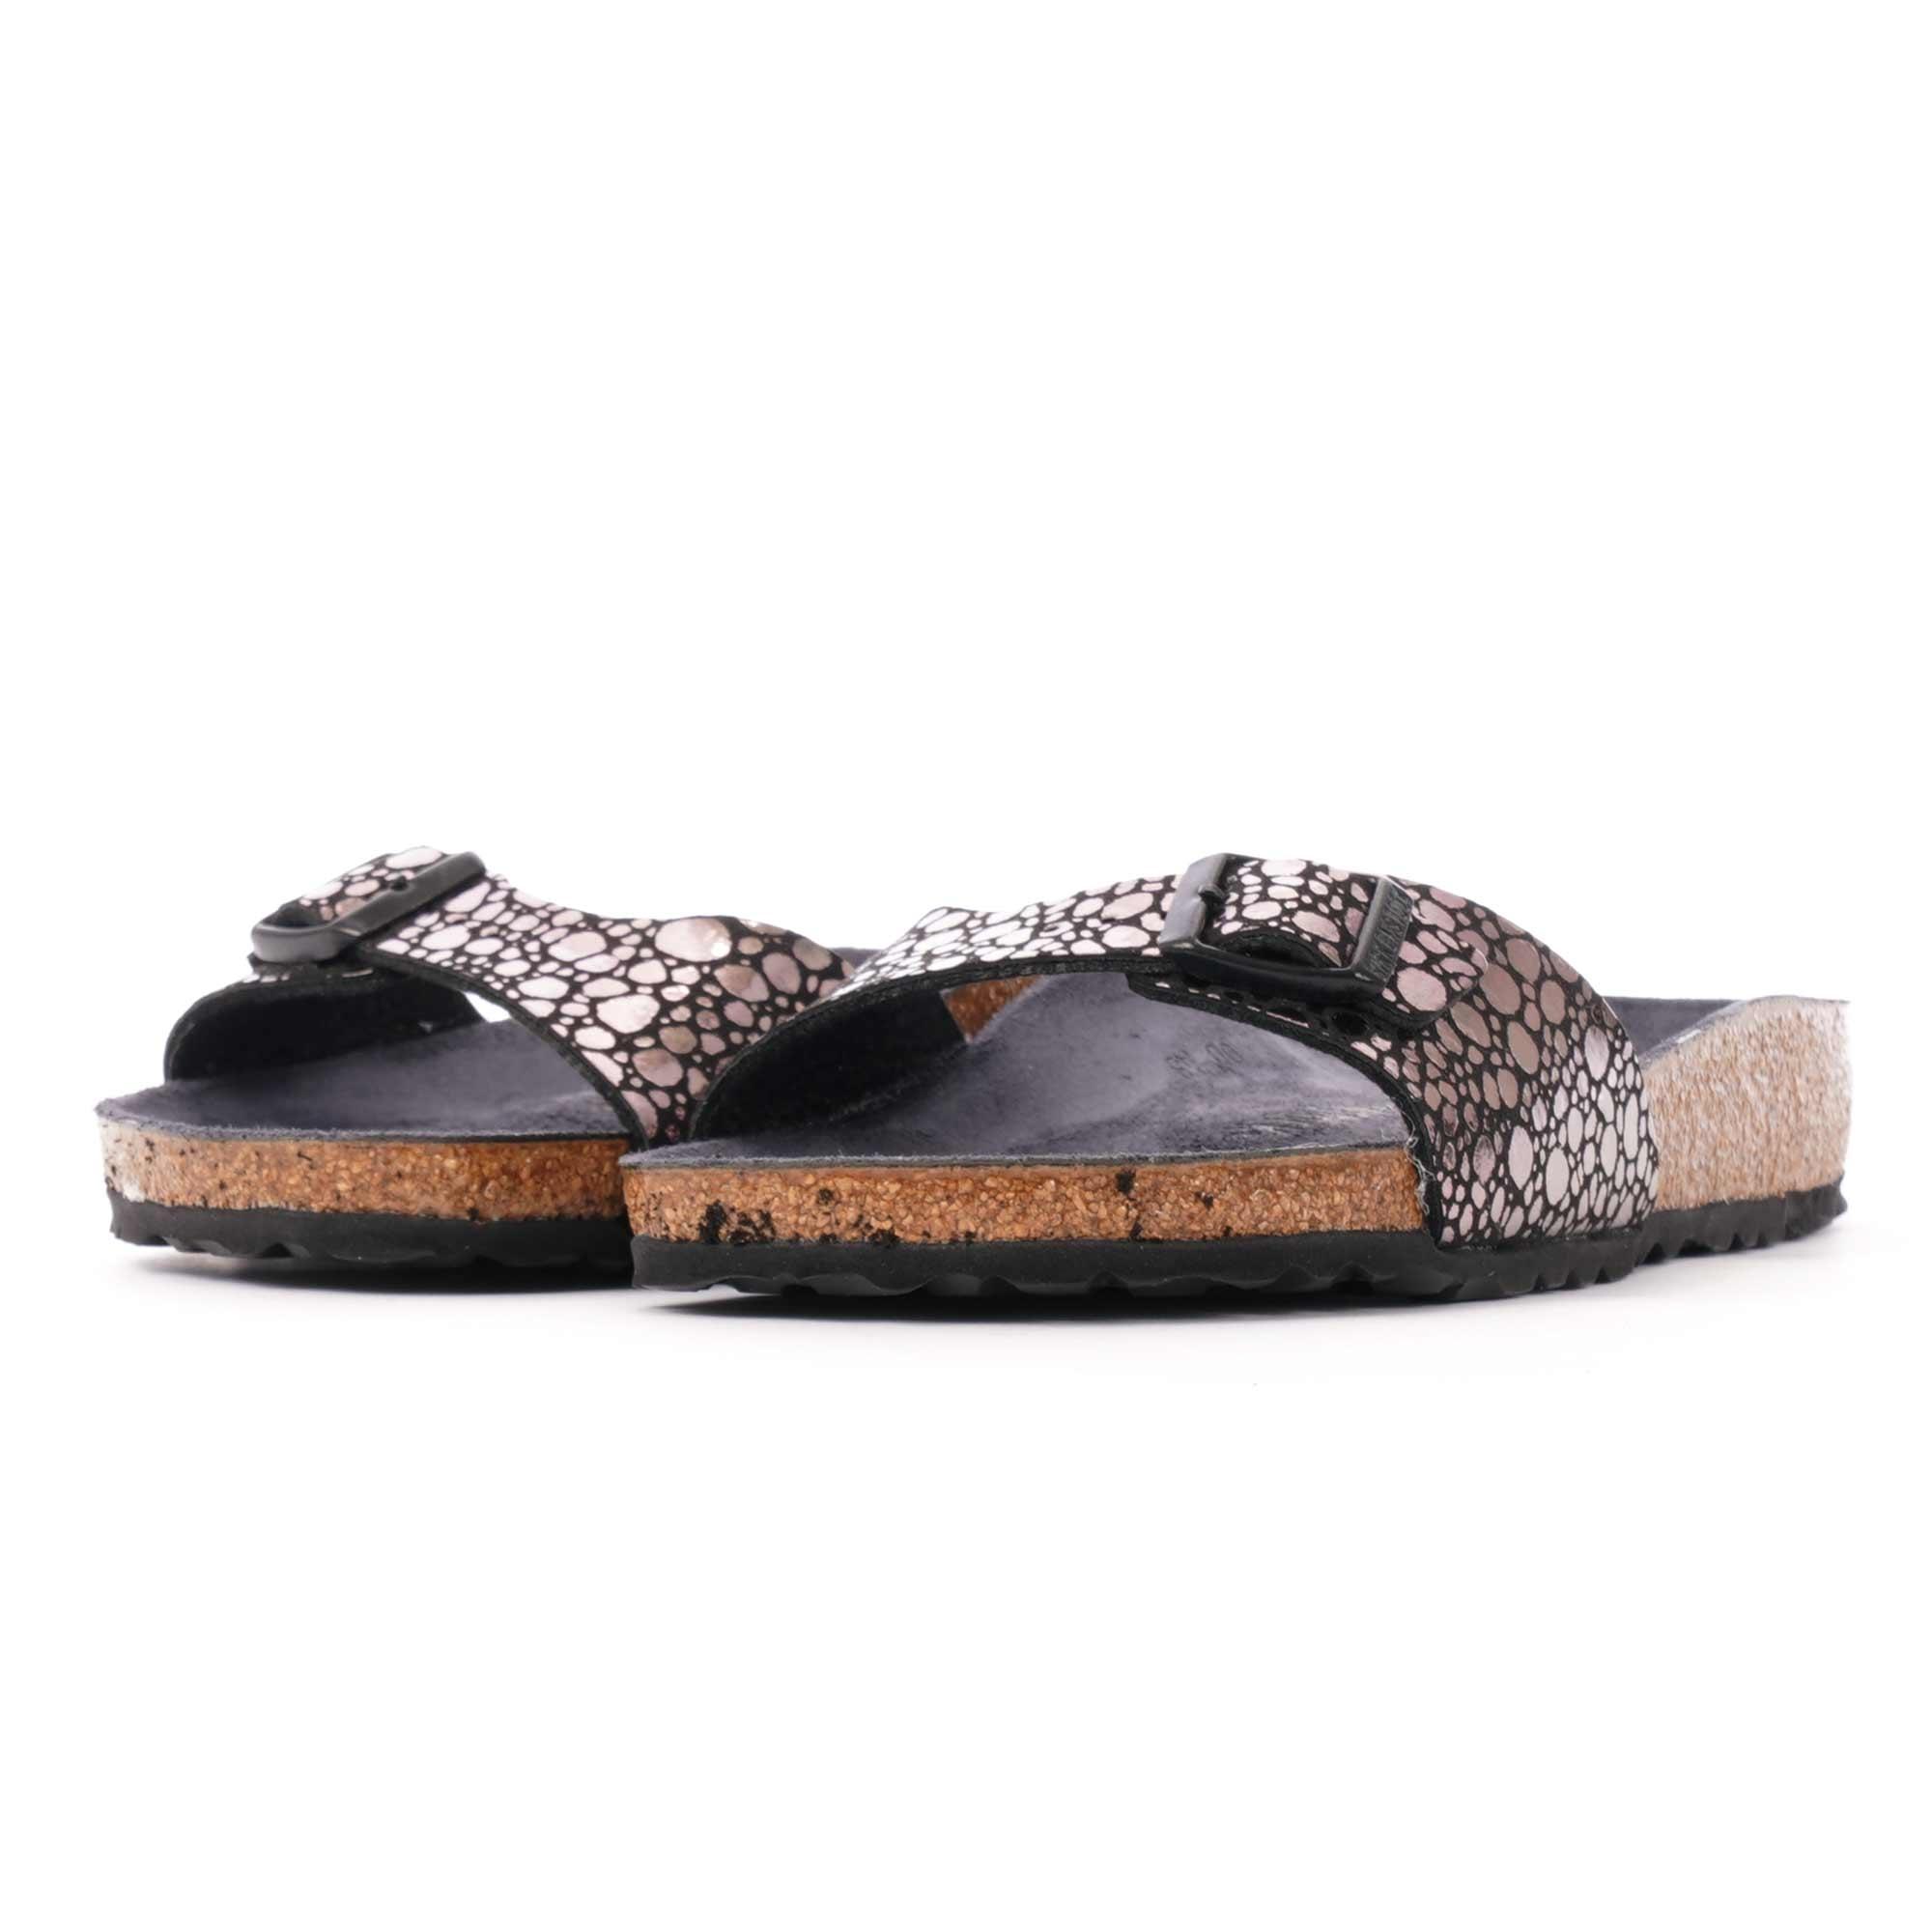 best service b6345 a4ec6 Madrid Sandals - Metallic Stones Black